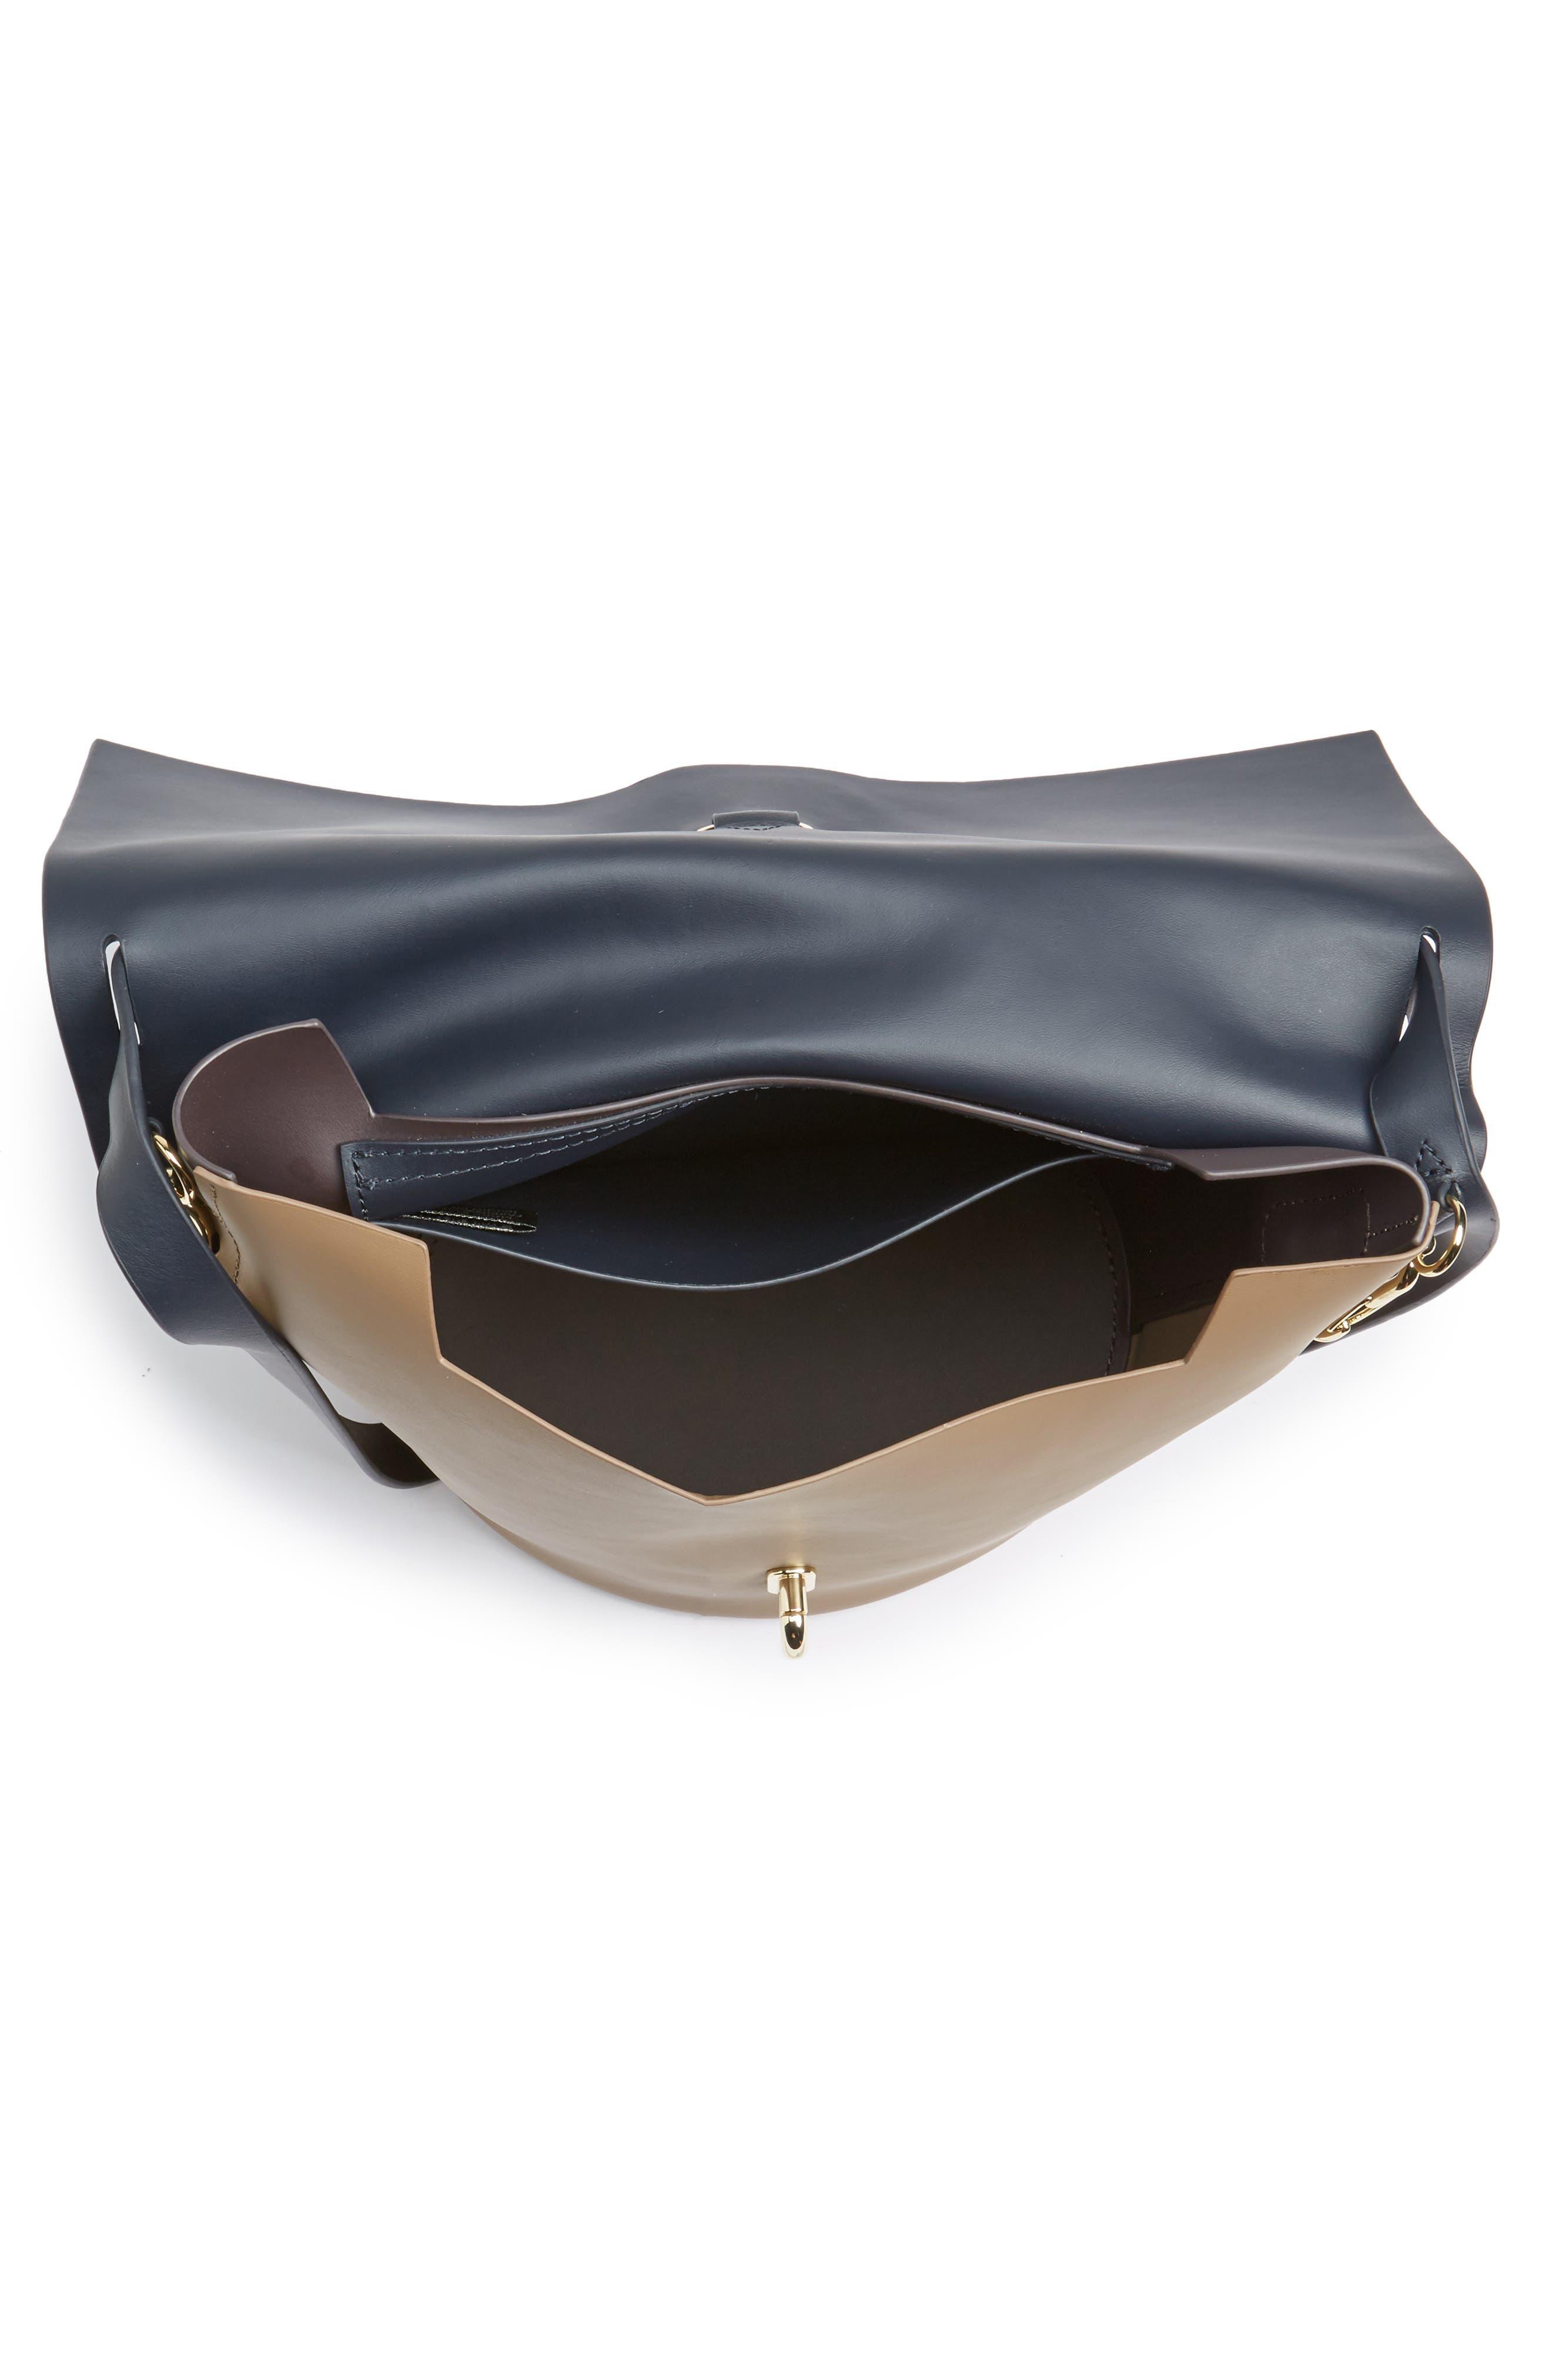 Belay Colorblock Calfskin Leather Bucket Bag,                             Alternate thumbnail 4, color,                             Navy Color Block